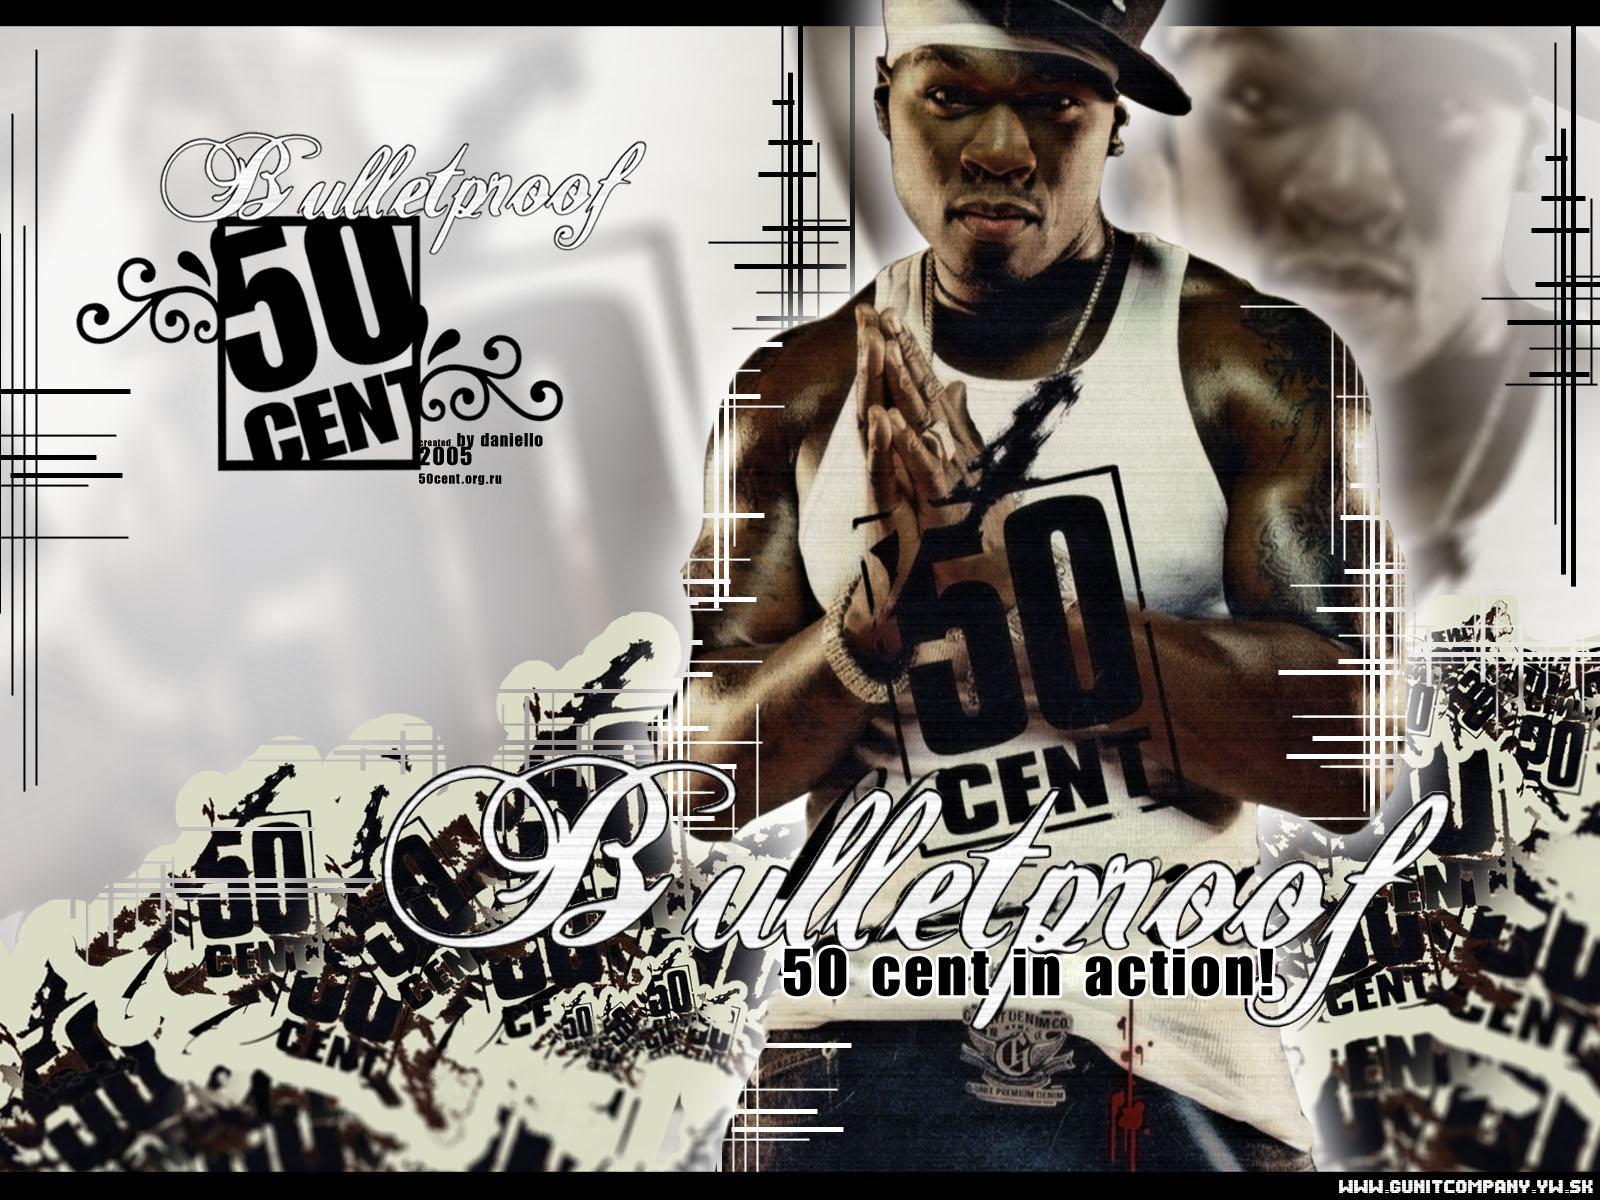 50 CENT gangsta rap rapper hip hop unit cent g wallpaper 1600x1200 1600x1200